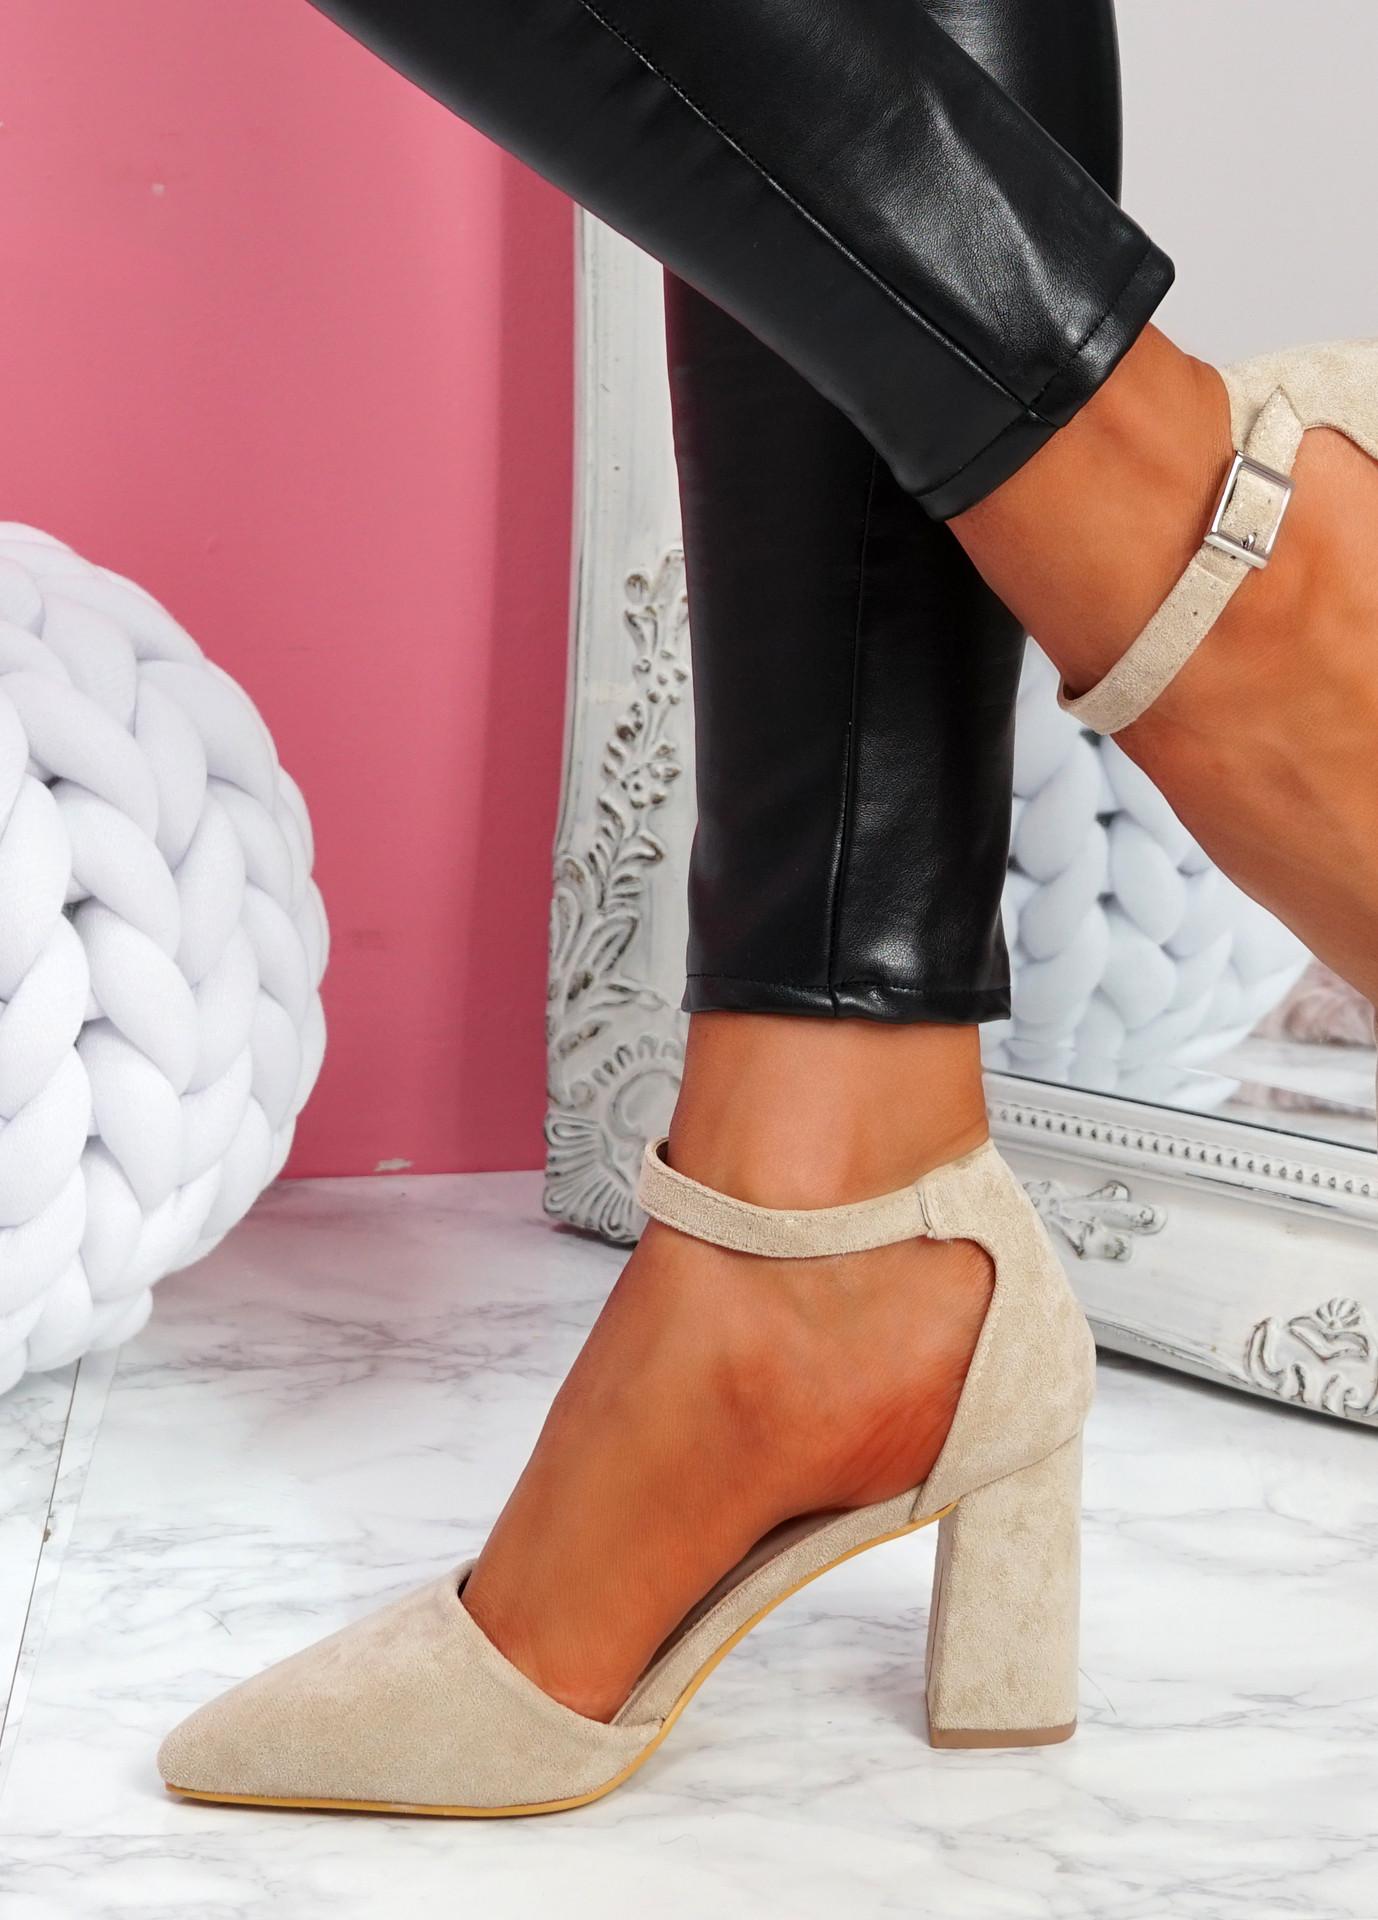 Pamma Apricot Ankle Strap Pumps